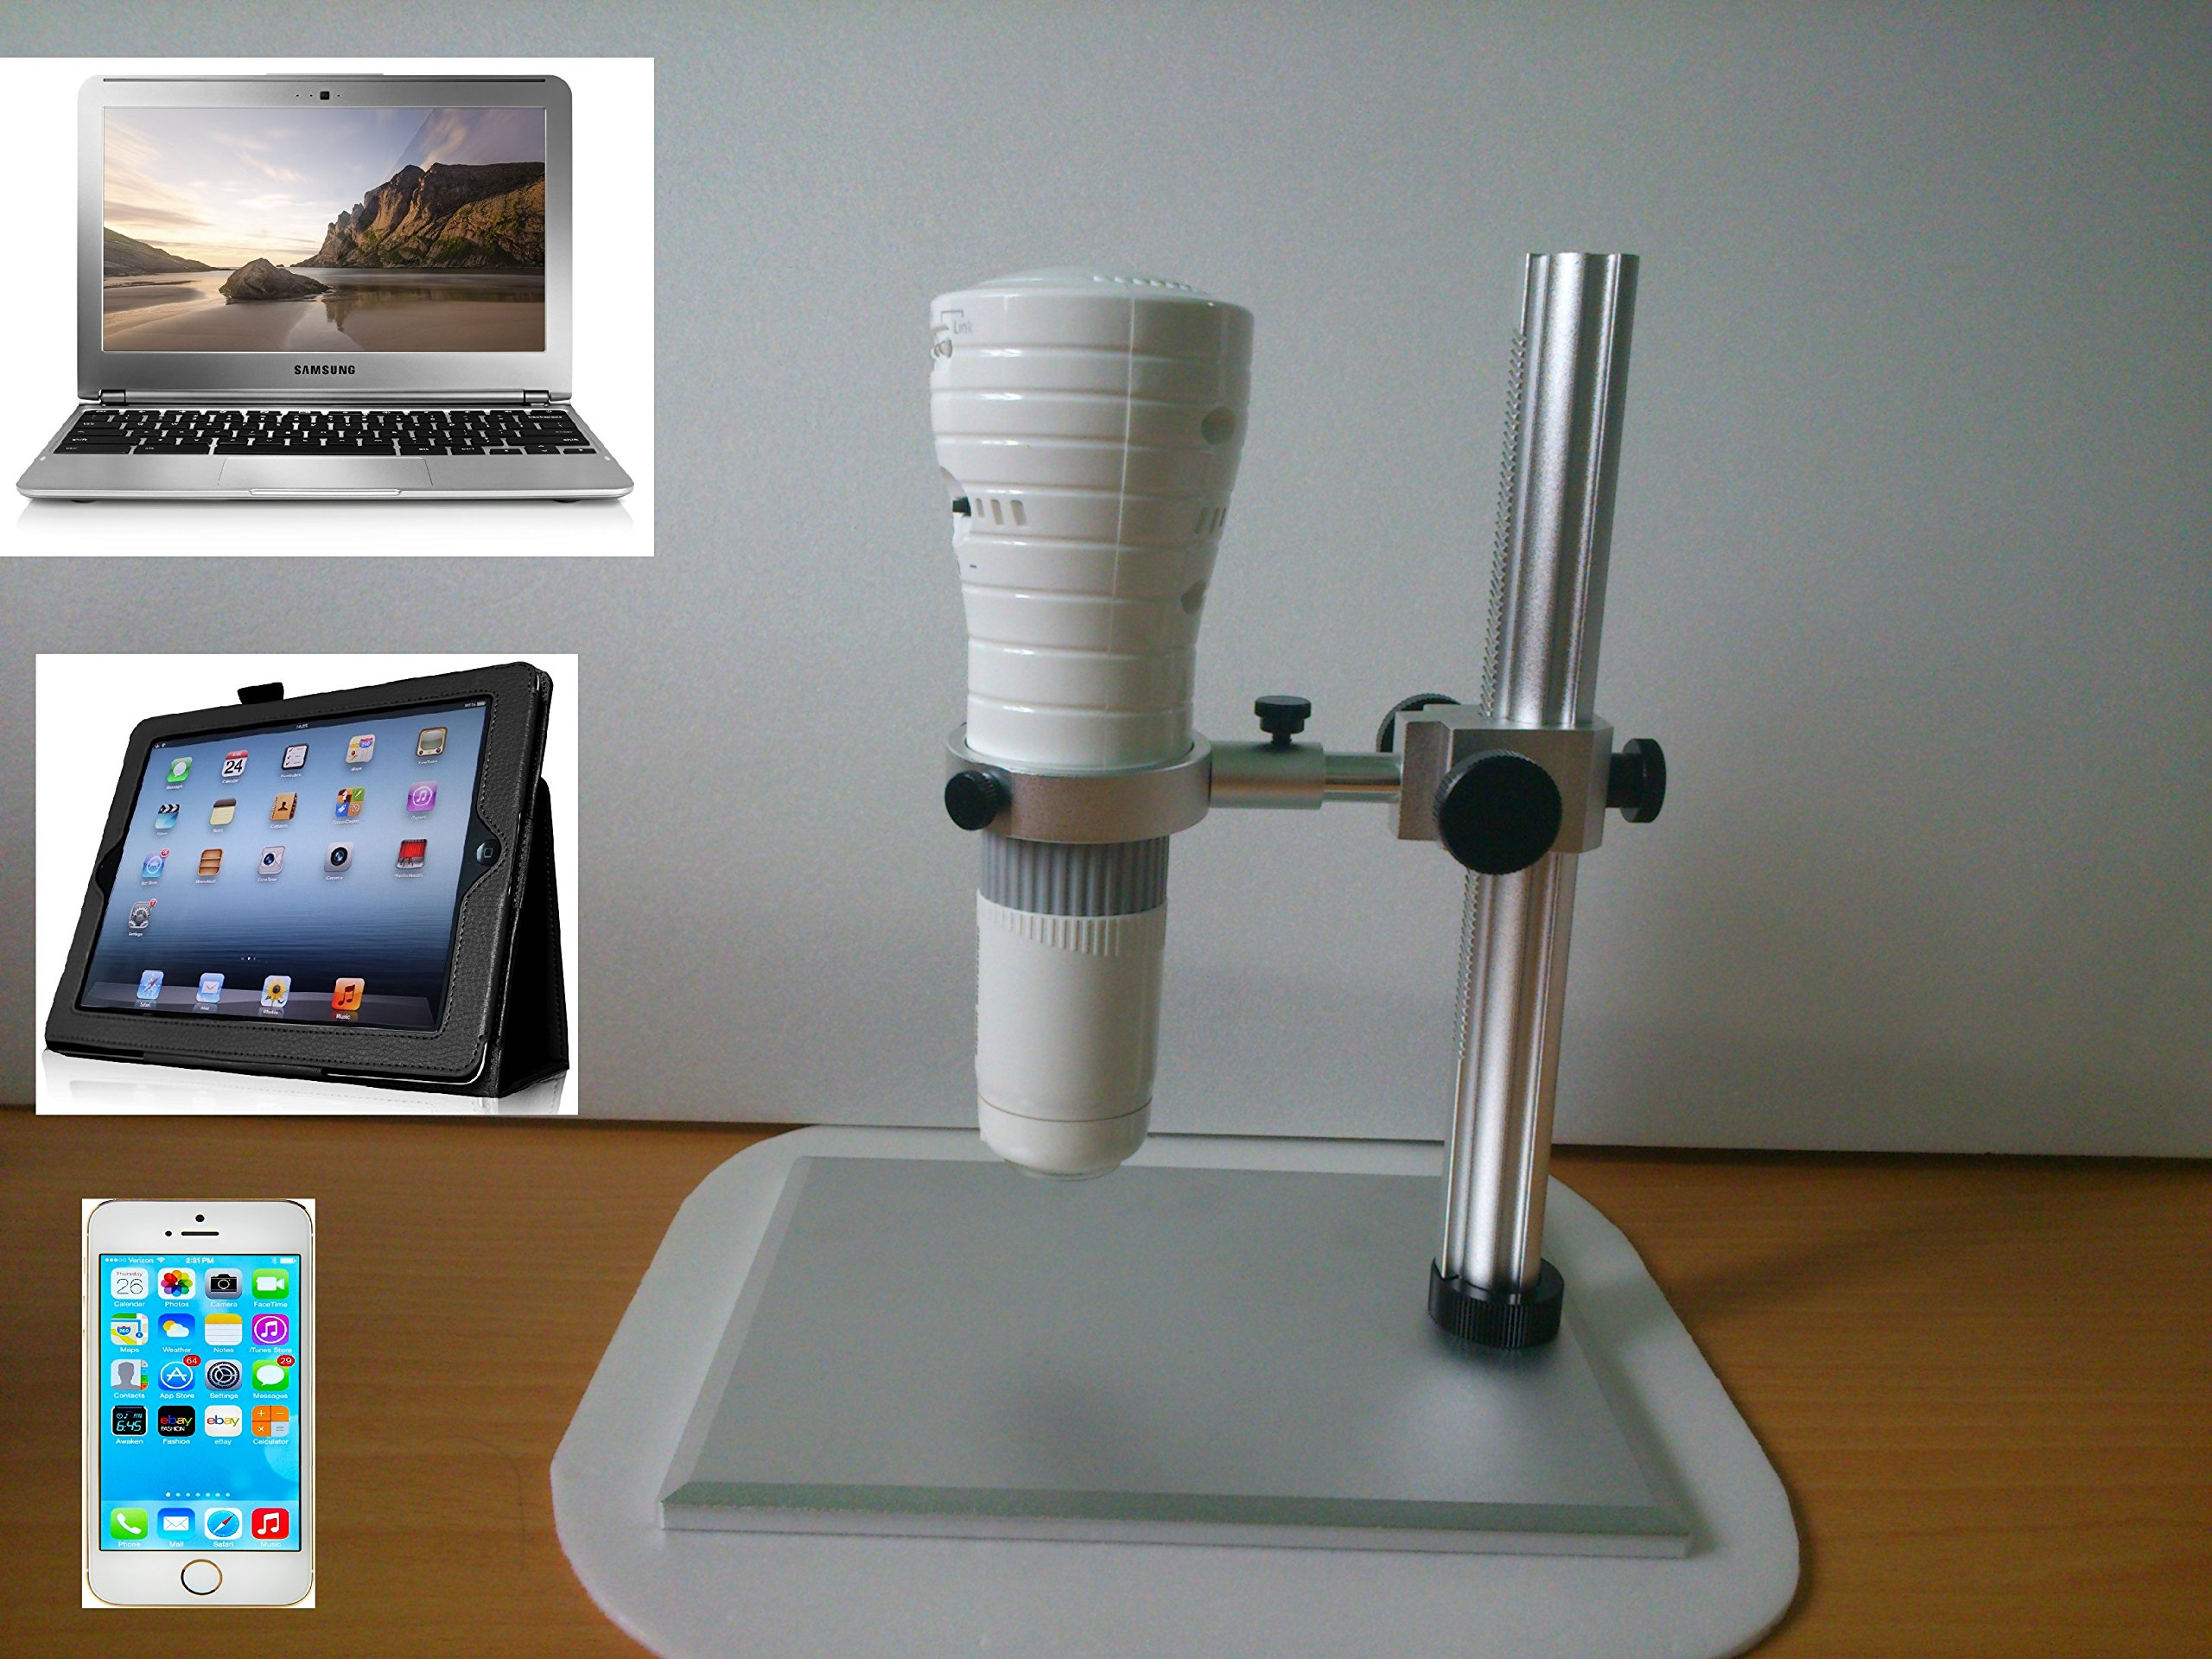 Vividia Wireless WiFi/USB Handheld Digital Microscope for iPhone/iPad/PC by Vividia